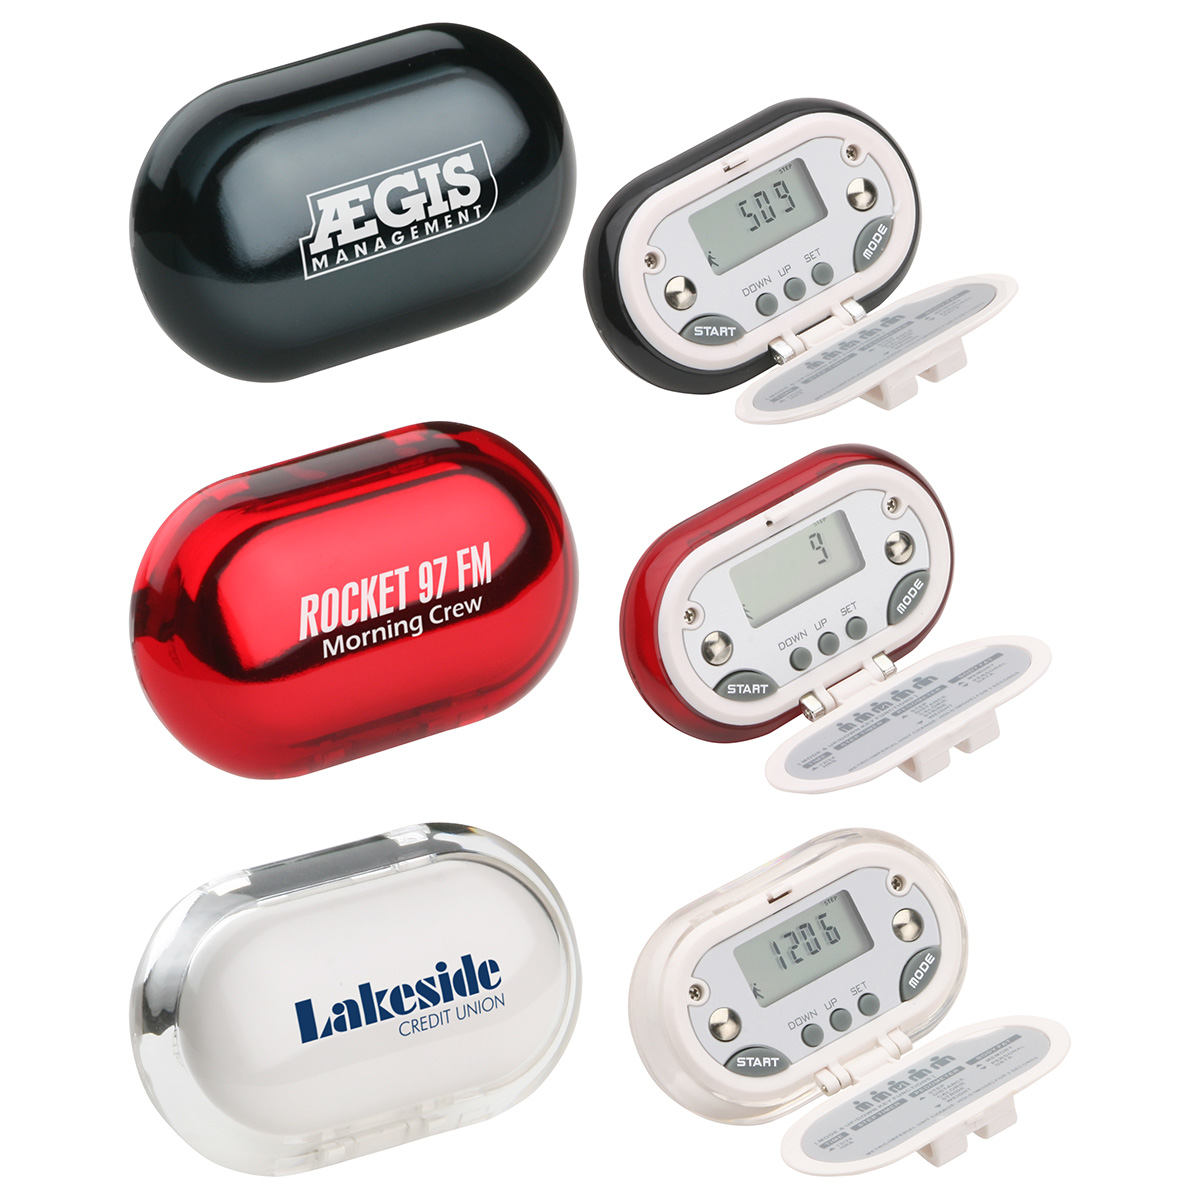 Gemstone BMI & Body Fat Pedometer, WHF-GB08 - 1 Colour Imprint